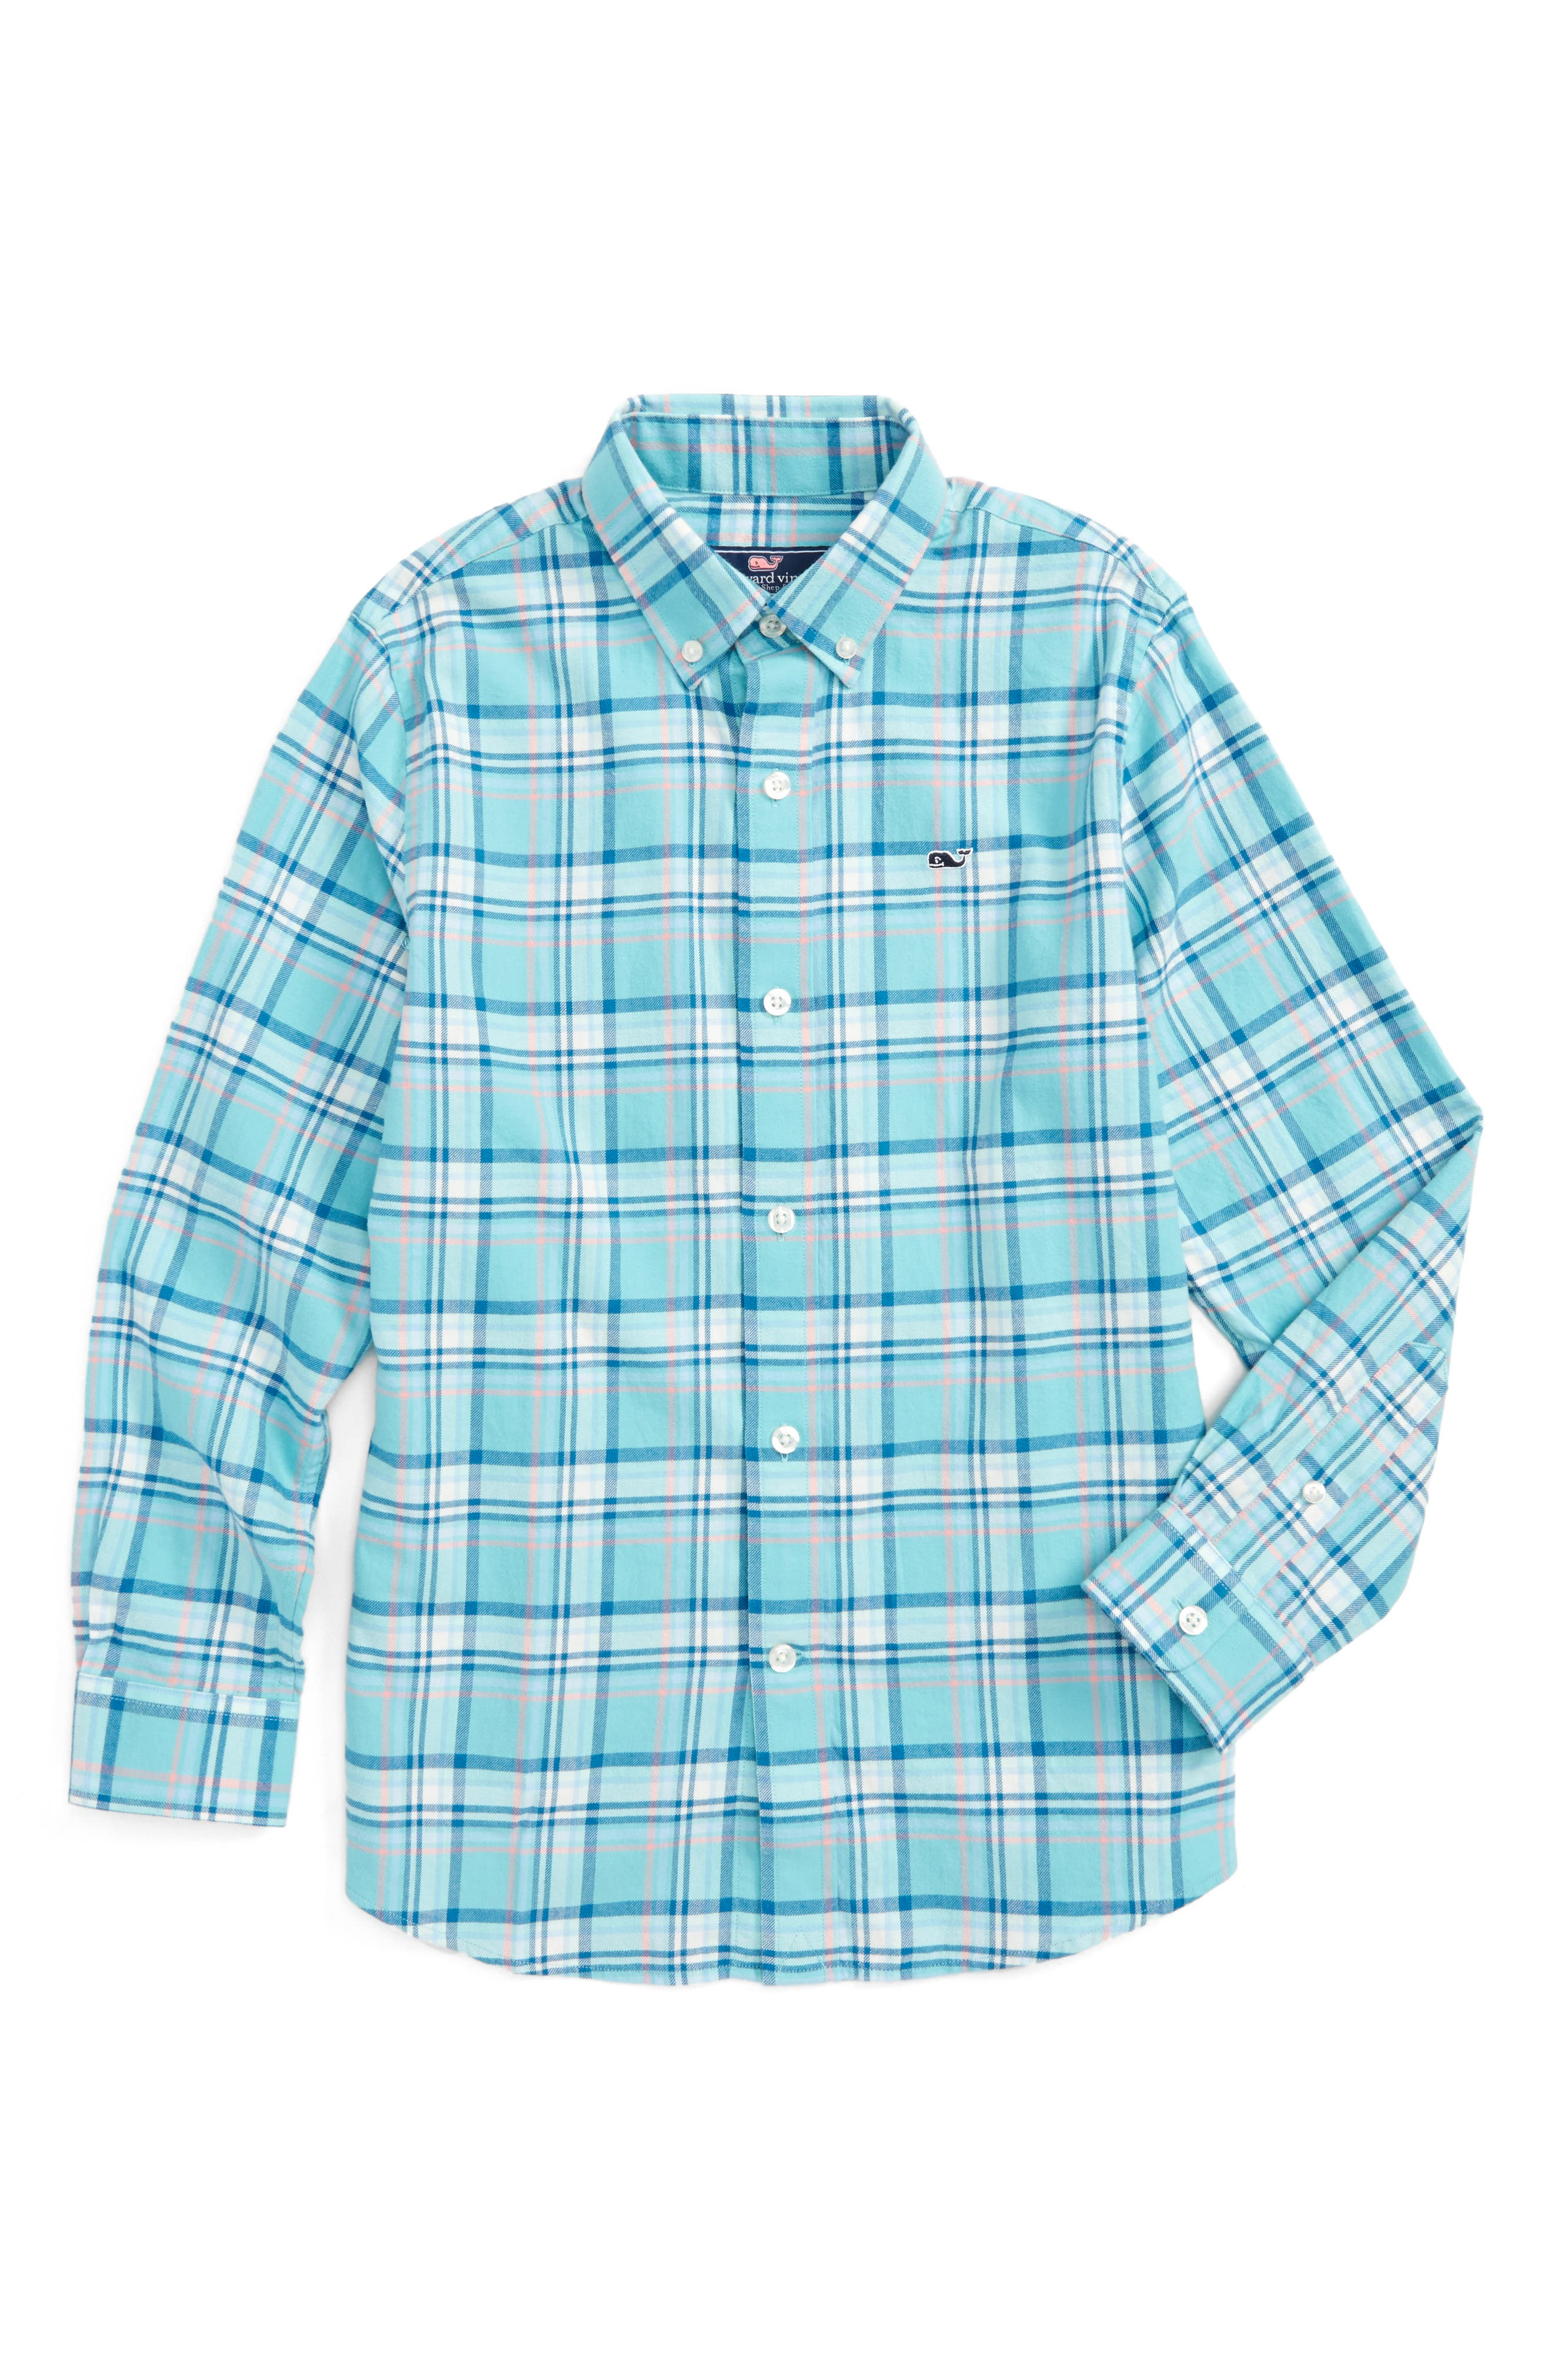 Loblolly Plaid Shirt,                         Main,                         color, 442